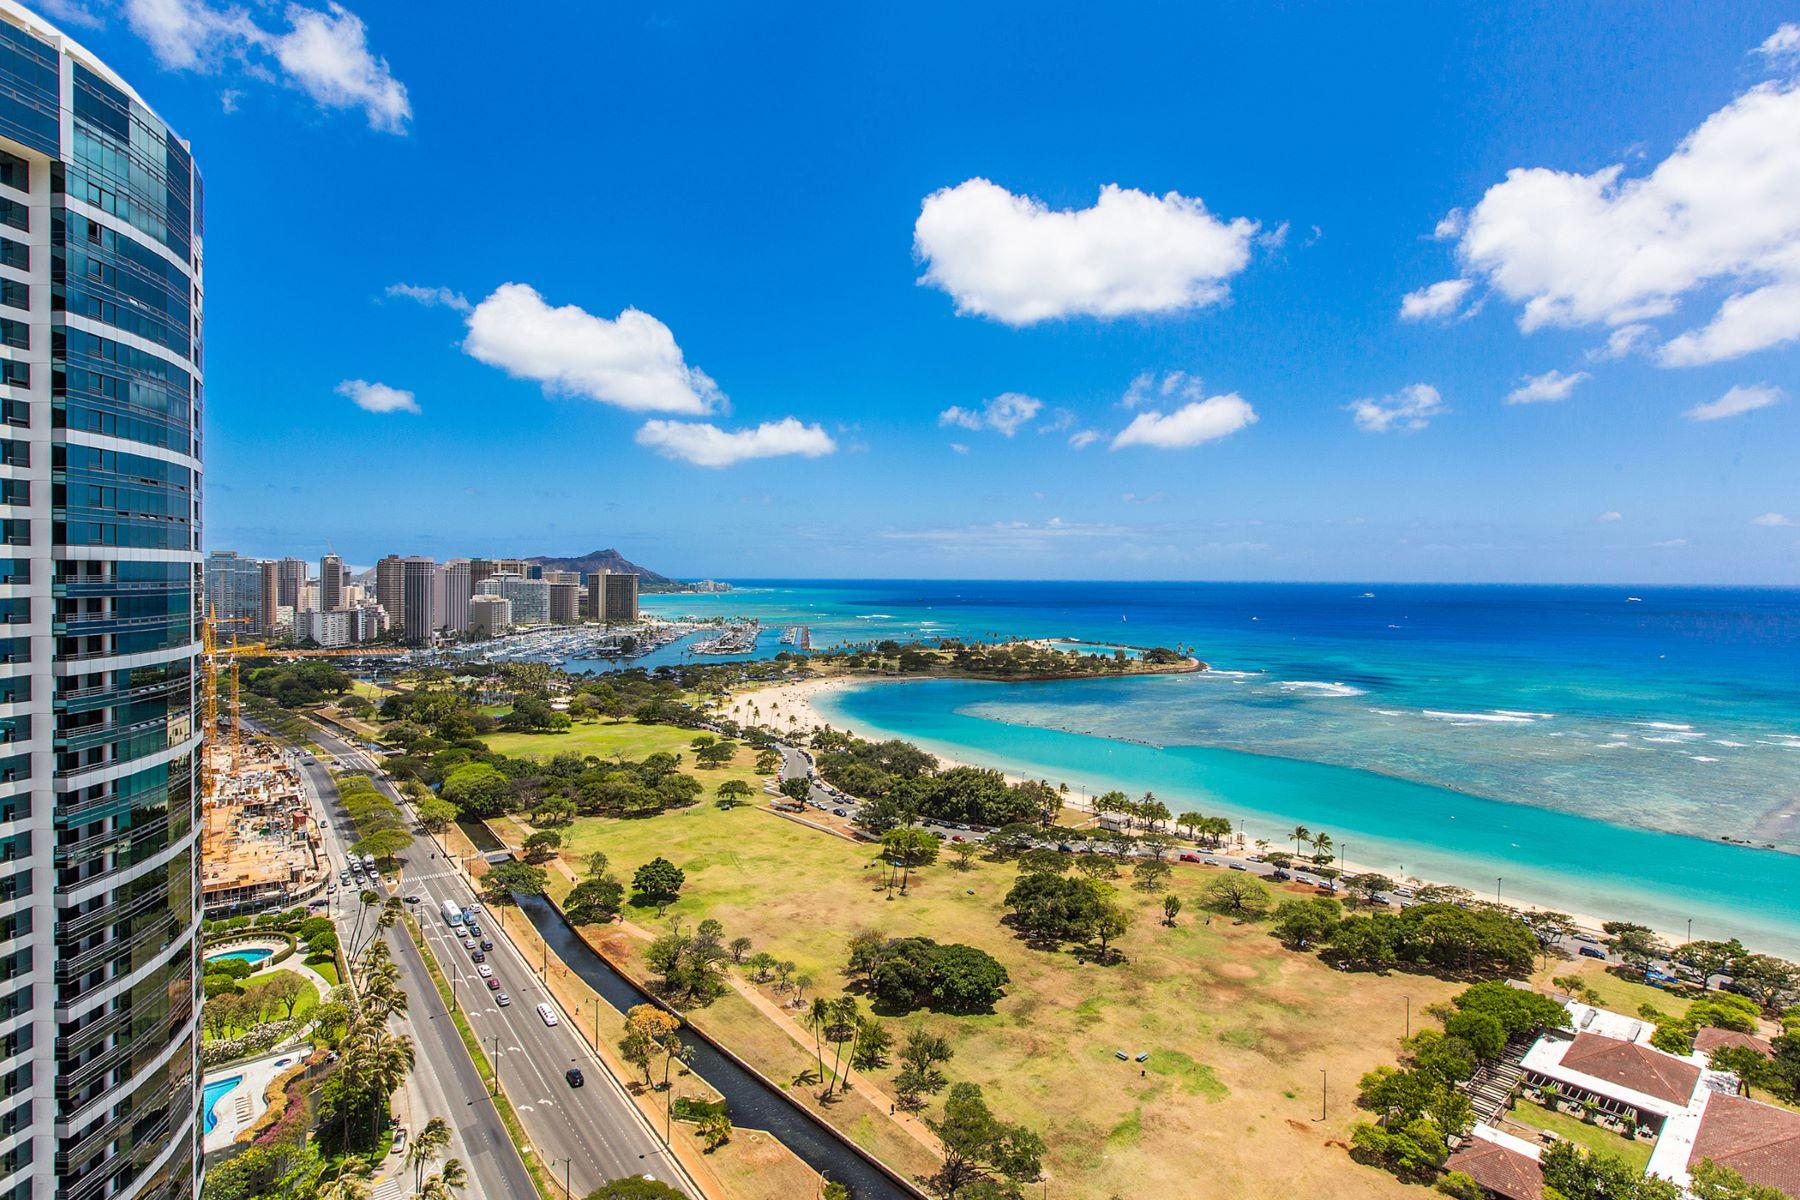 Nhà chung cư vì Bán tại Premier Ocean Views 1288 Ala Moana Boulevard #29E Honolulu, Hawaii, 96814 Hoa Kỳ